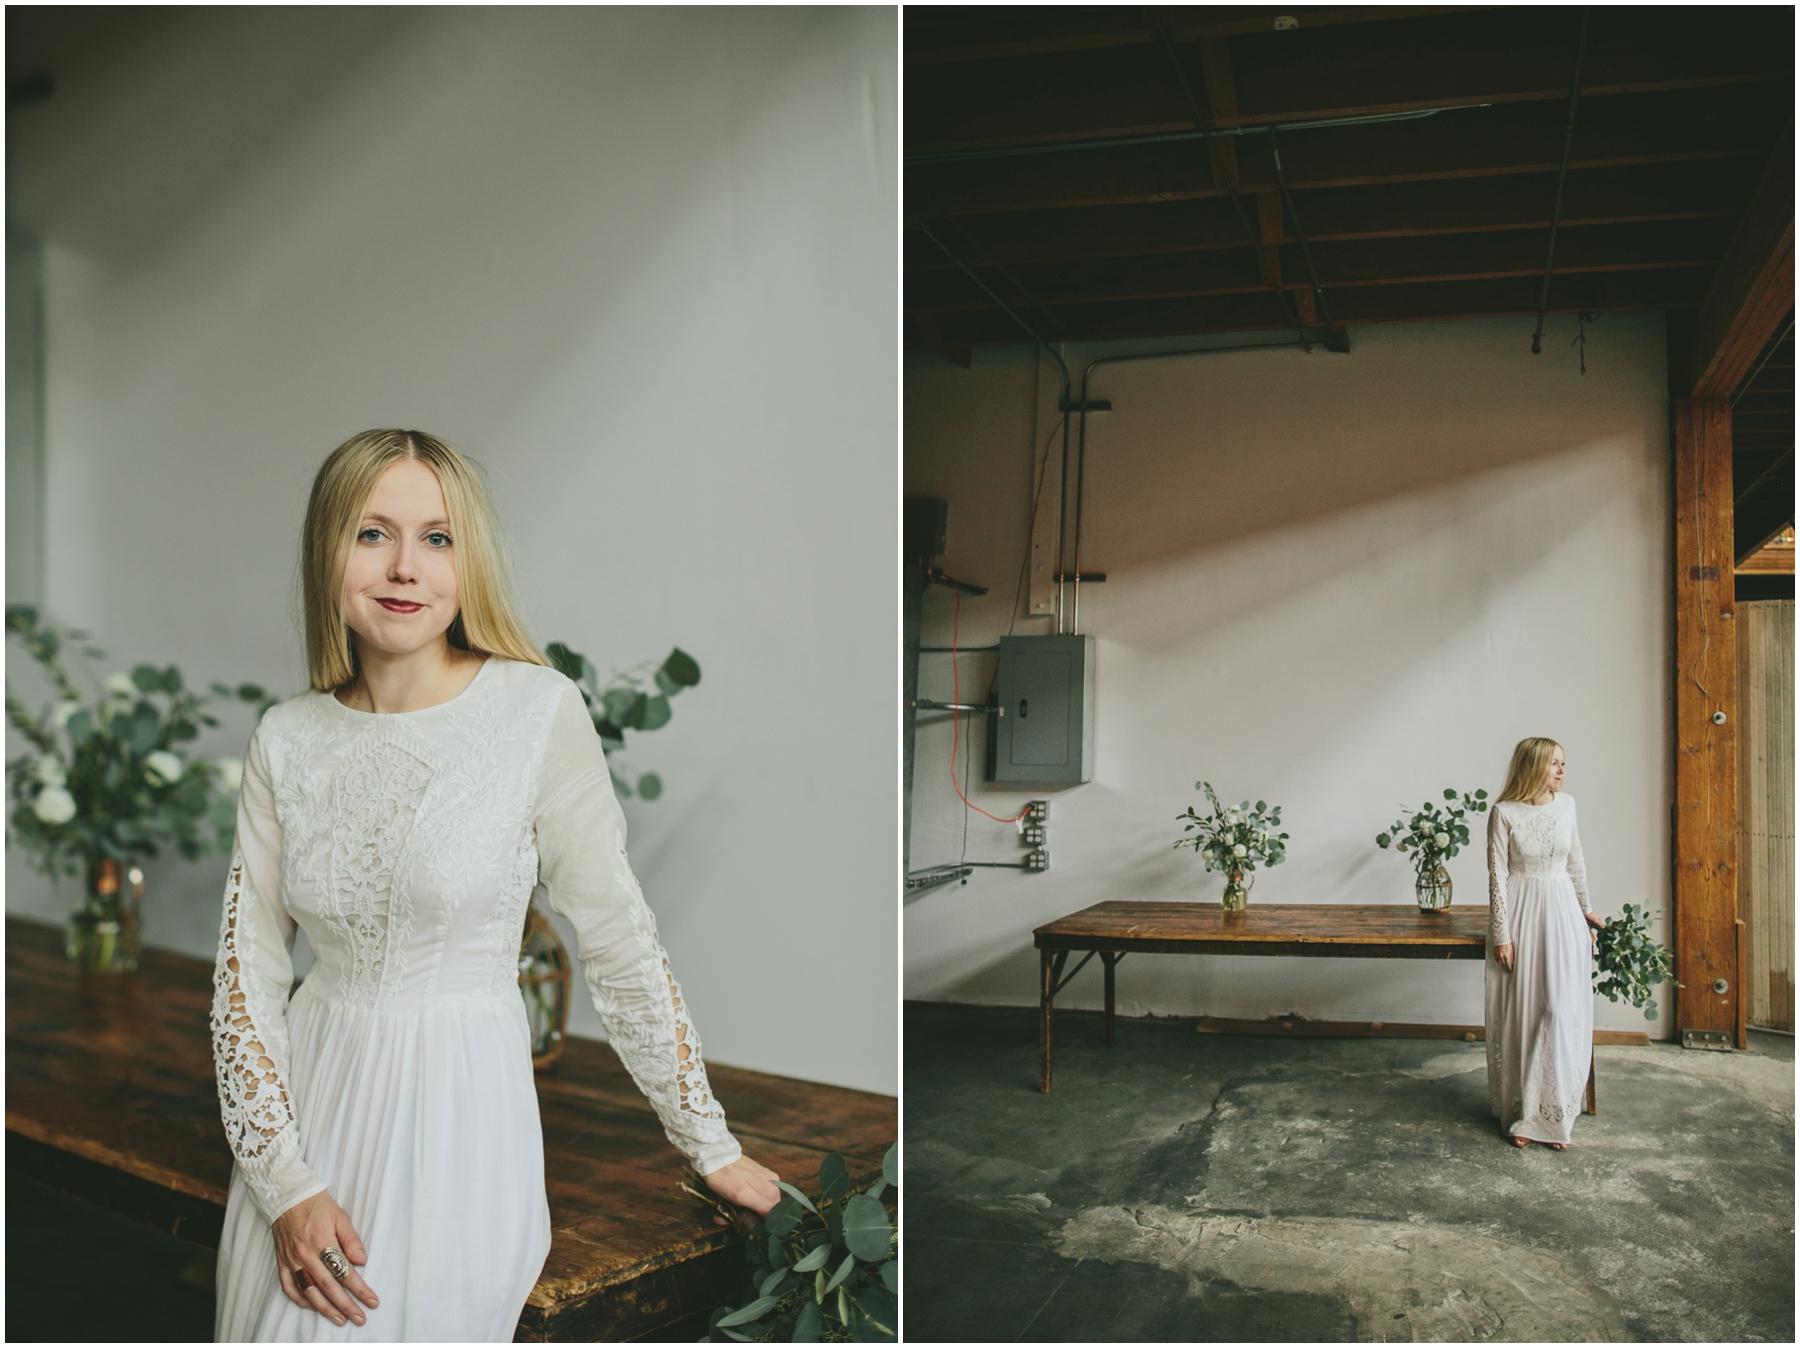 Natalie+Corey-WEDDING_KELLYBOITANO_0042